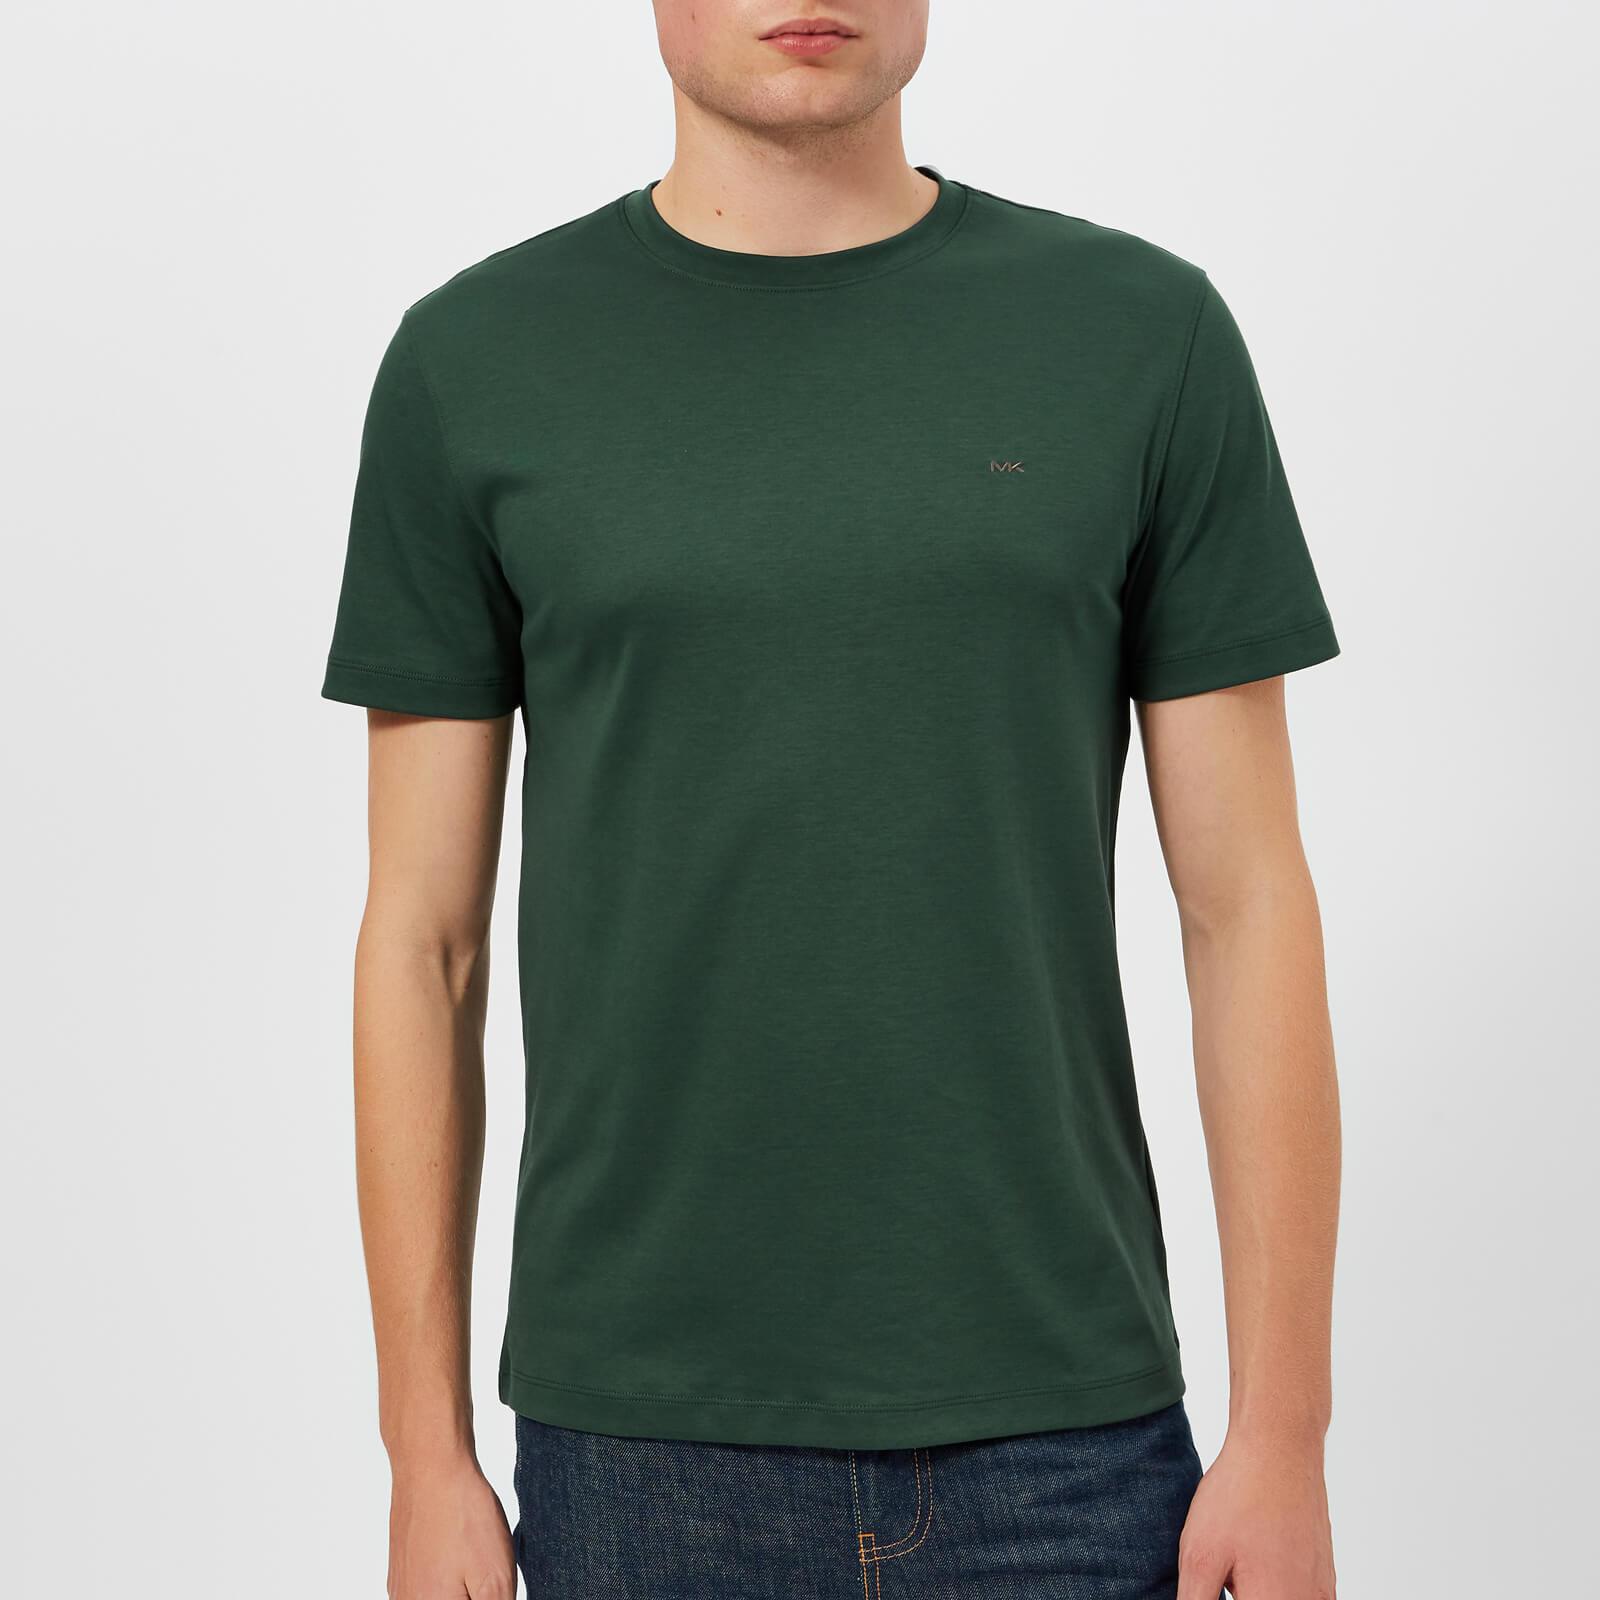 a645705697e Michael Kors Men s Sleek Crew Neck T-Shirt - Spruce Green Clothing ...